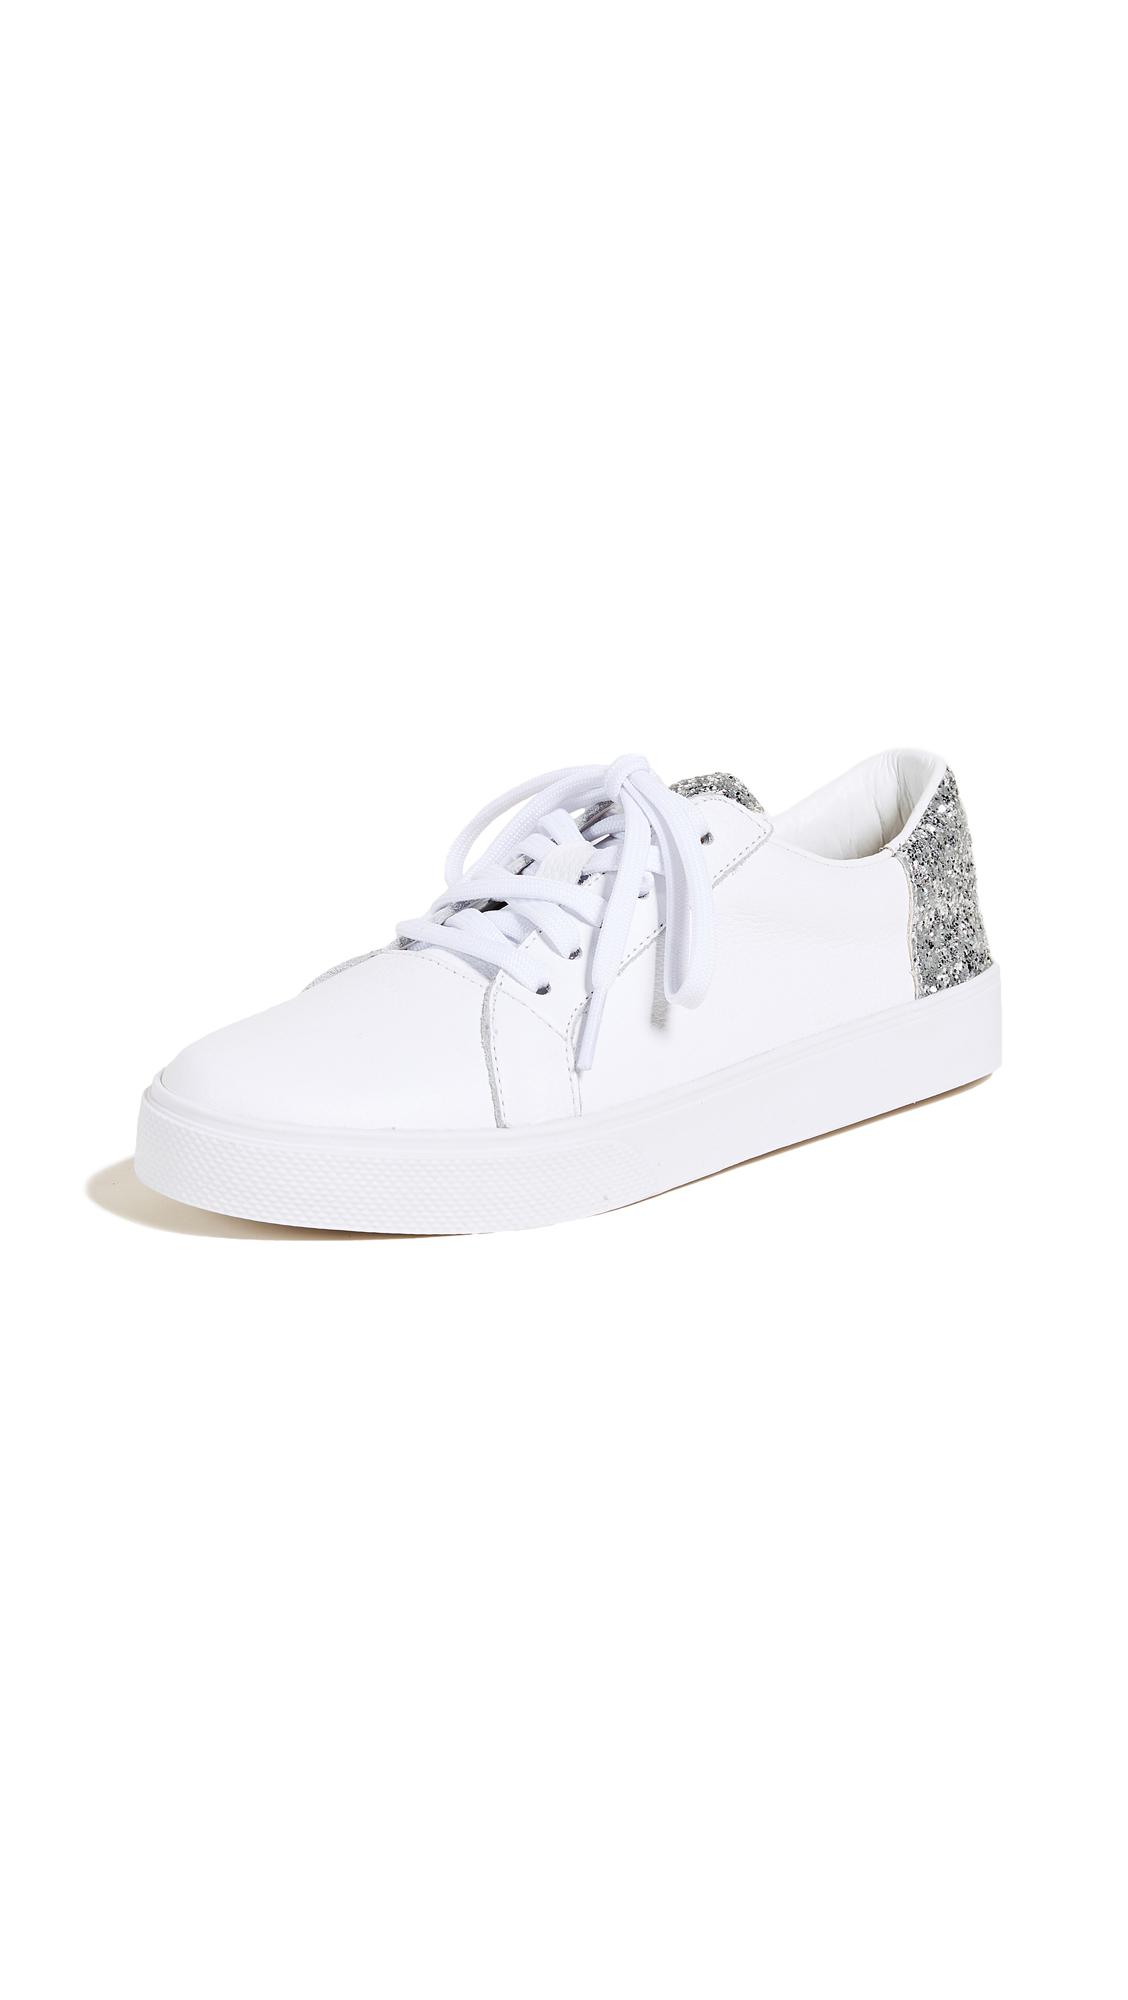 KAANAS San Rafael Sneakers - Silver